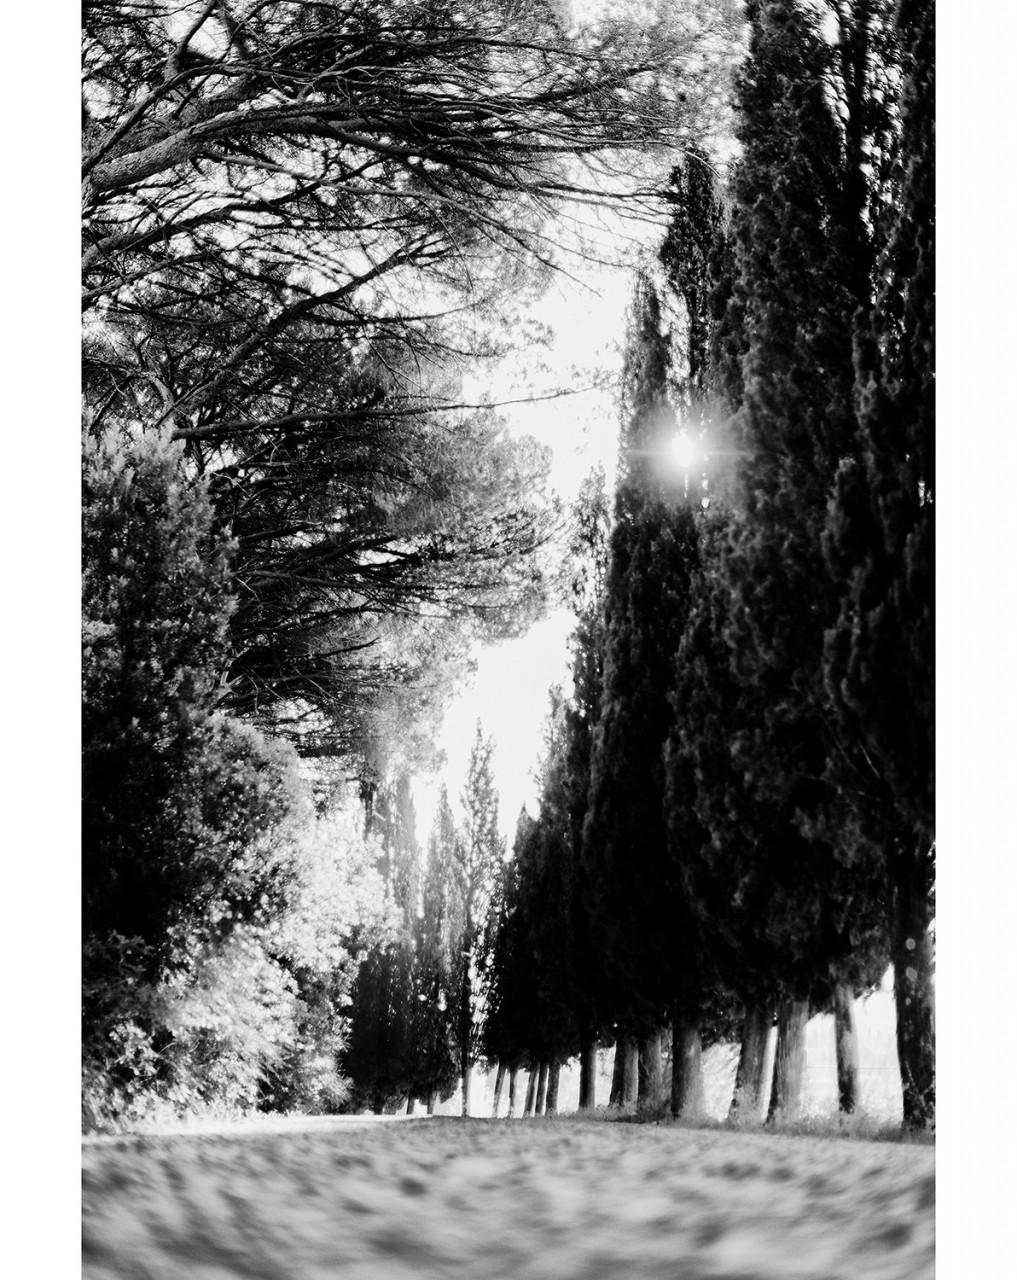 022_TuscanWalk